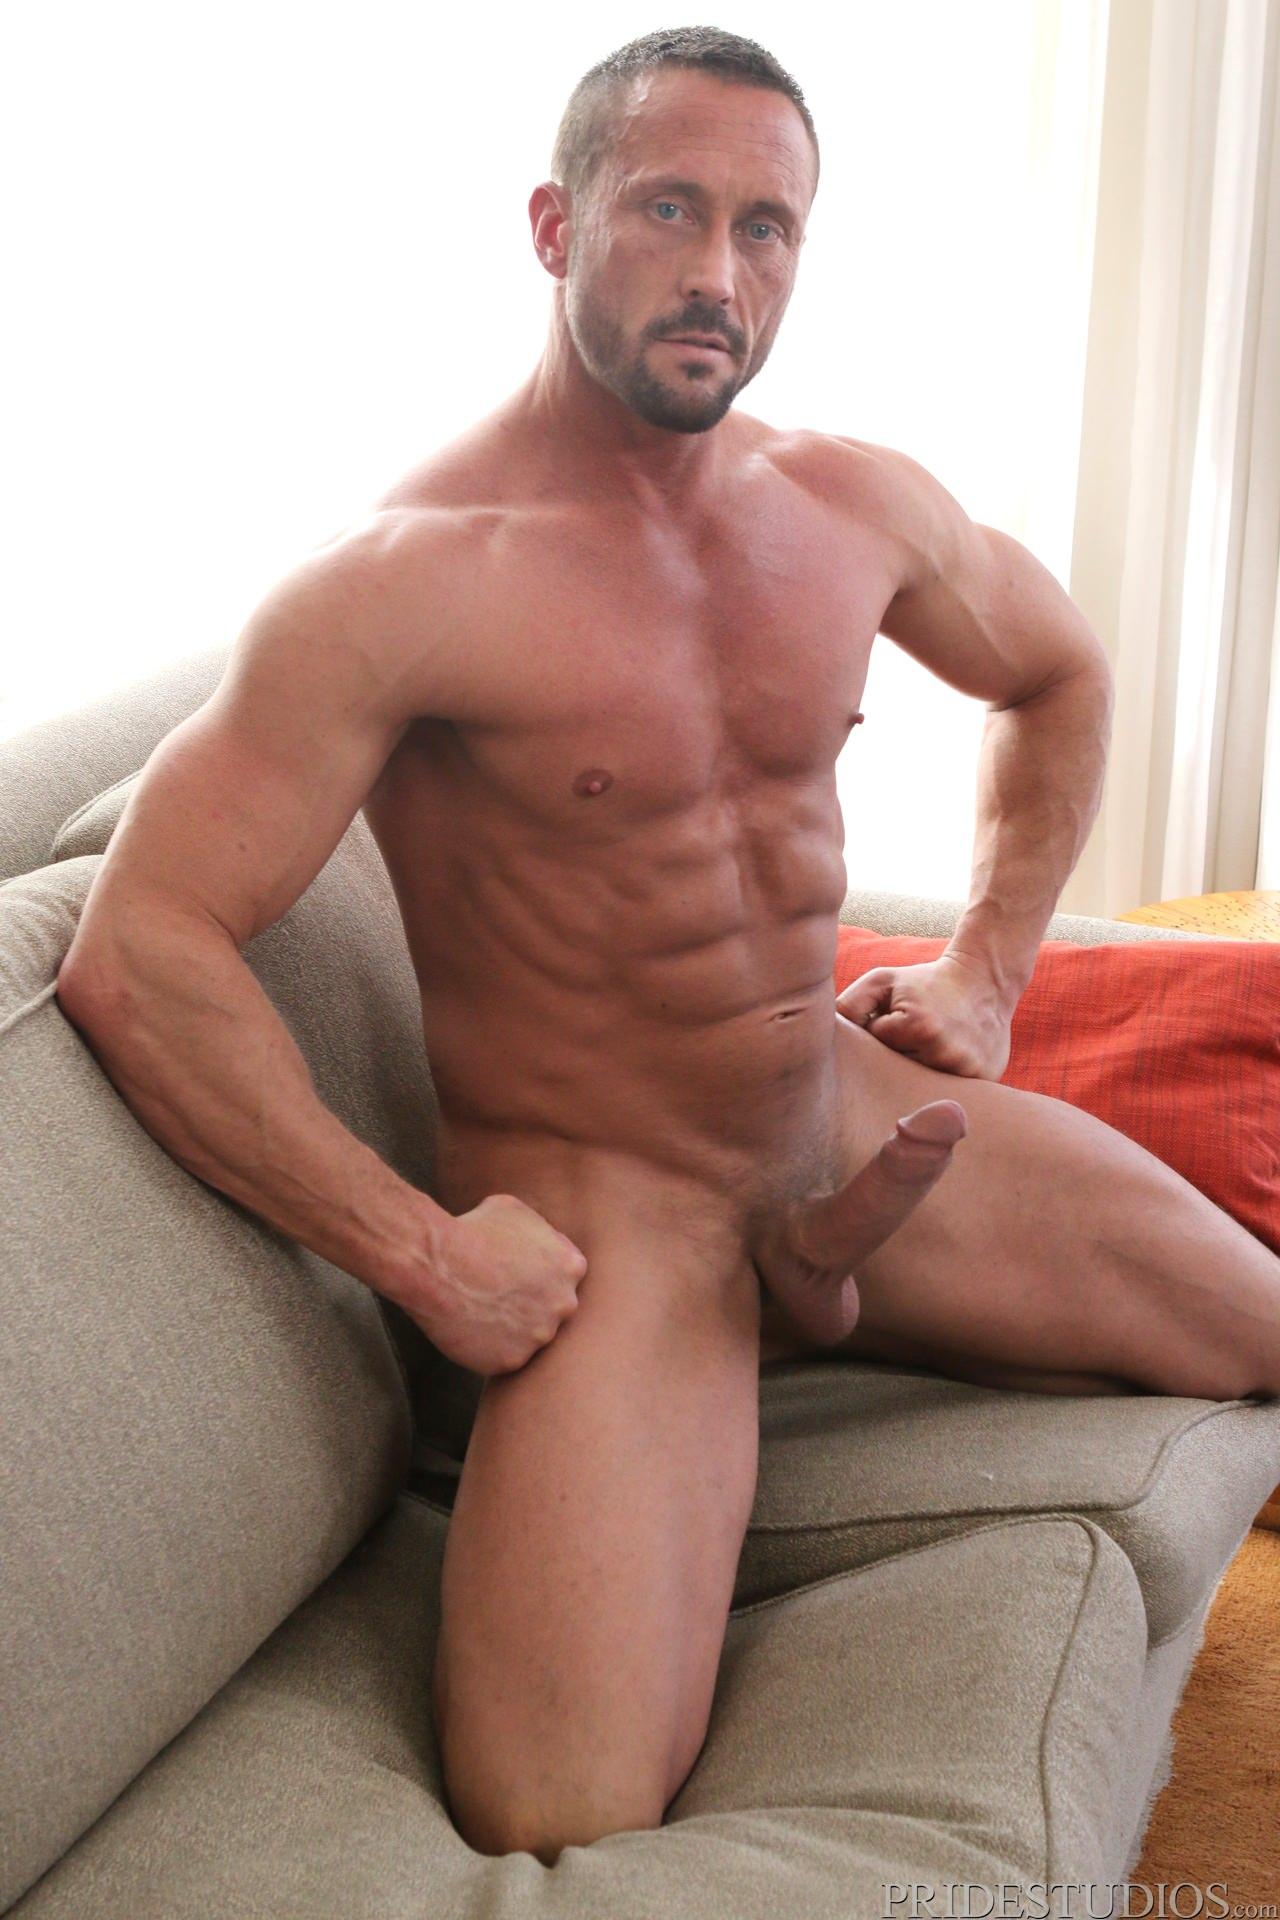 max riemelt nude gay scenes